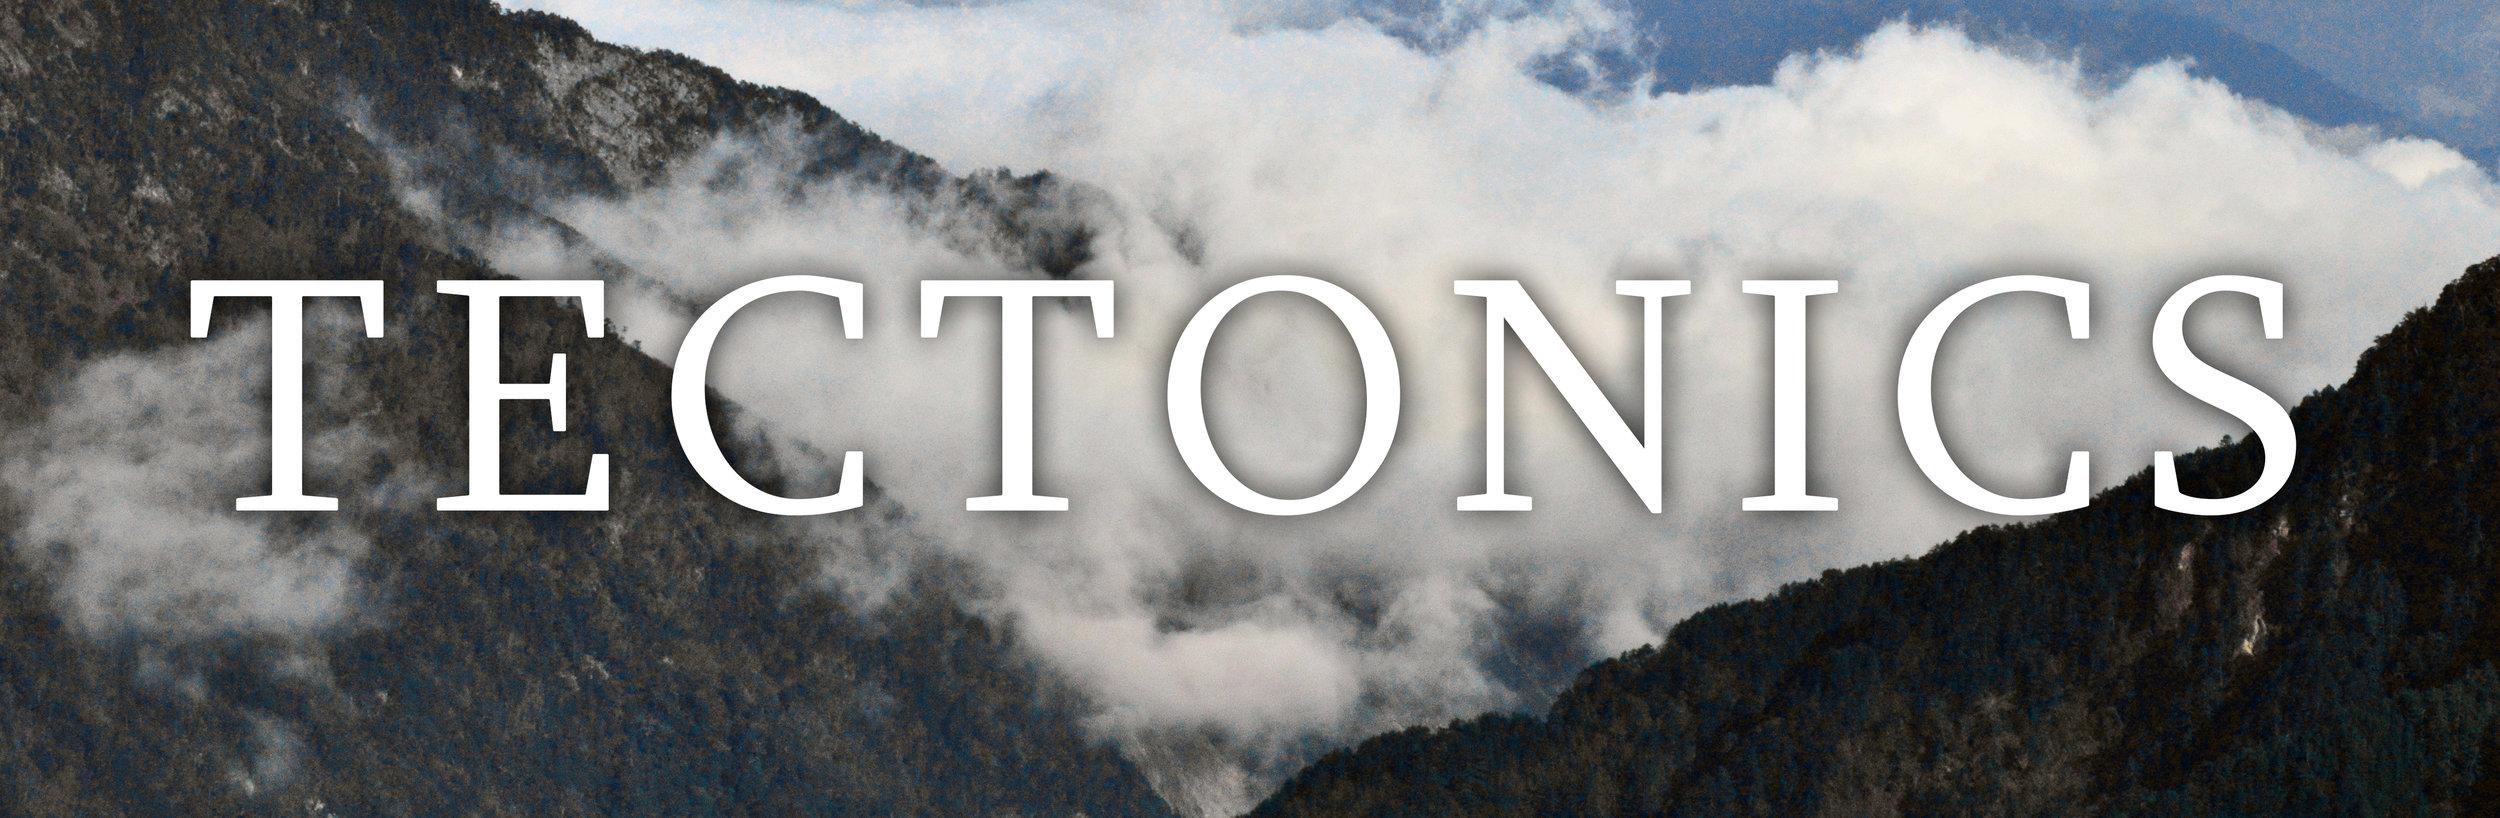 tectonics banner.jpg